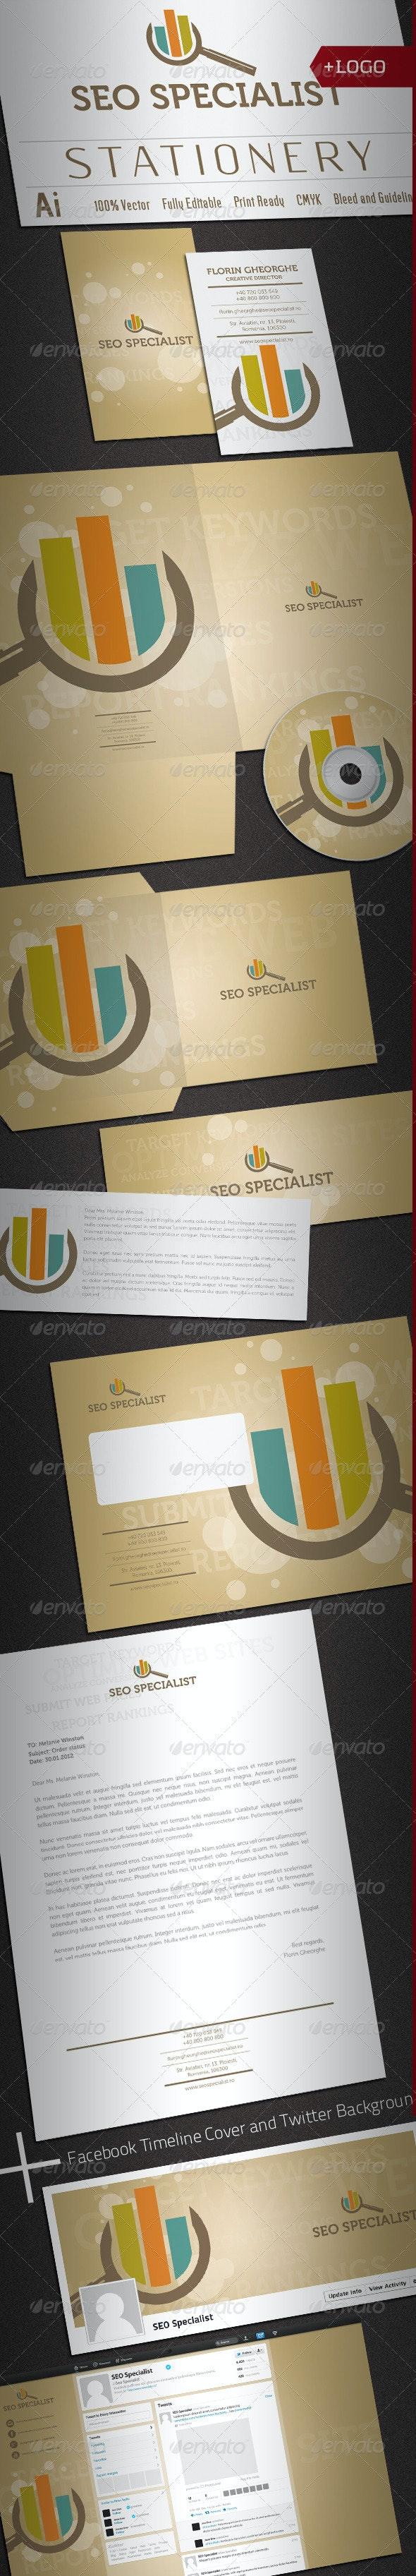 Seo Specialist Stationery - Stationery Print Templates